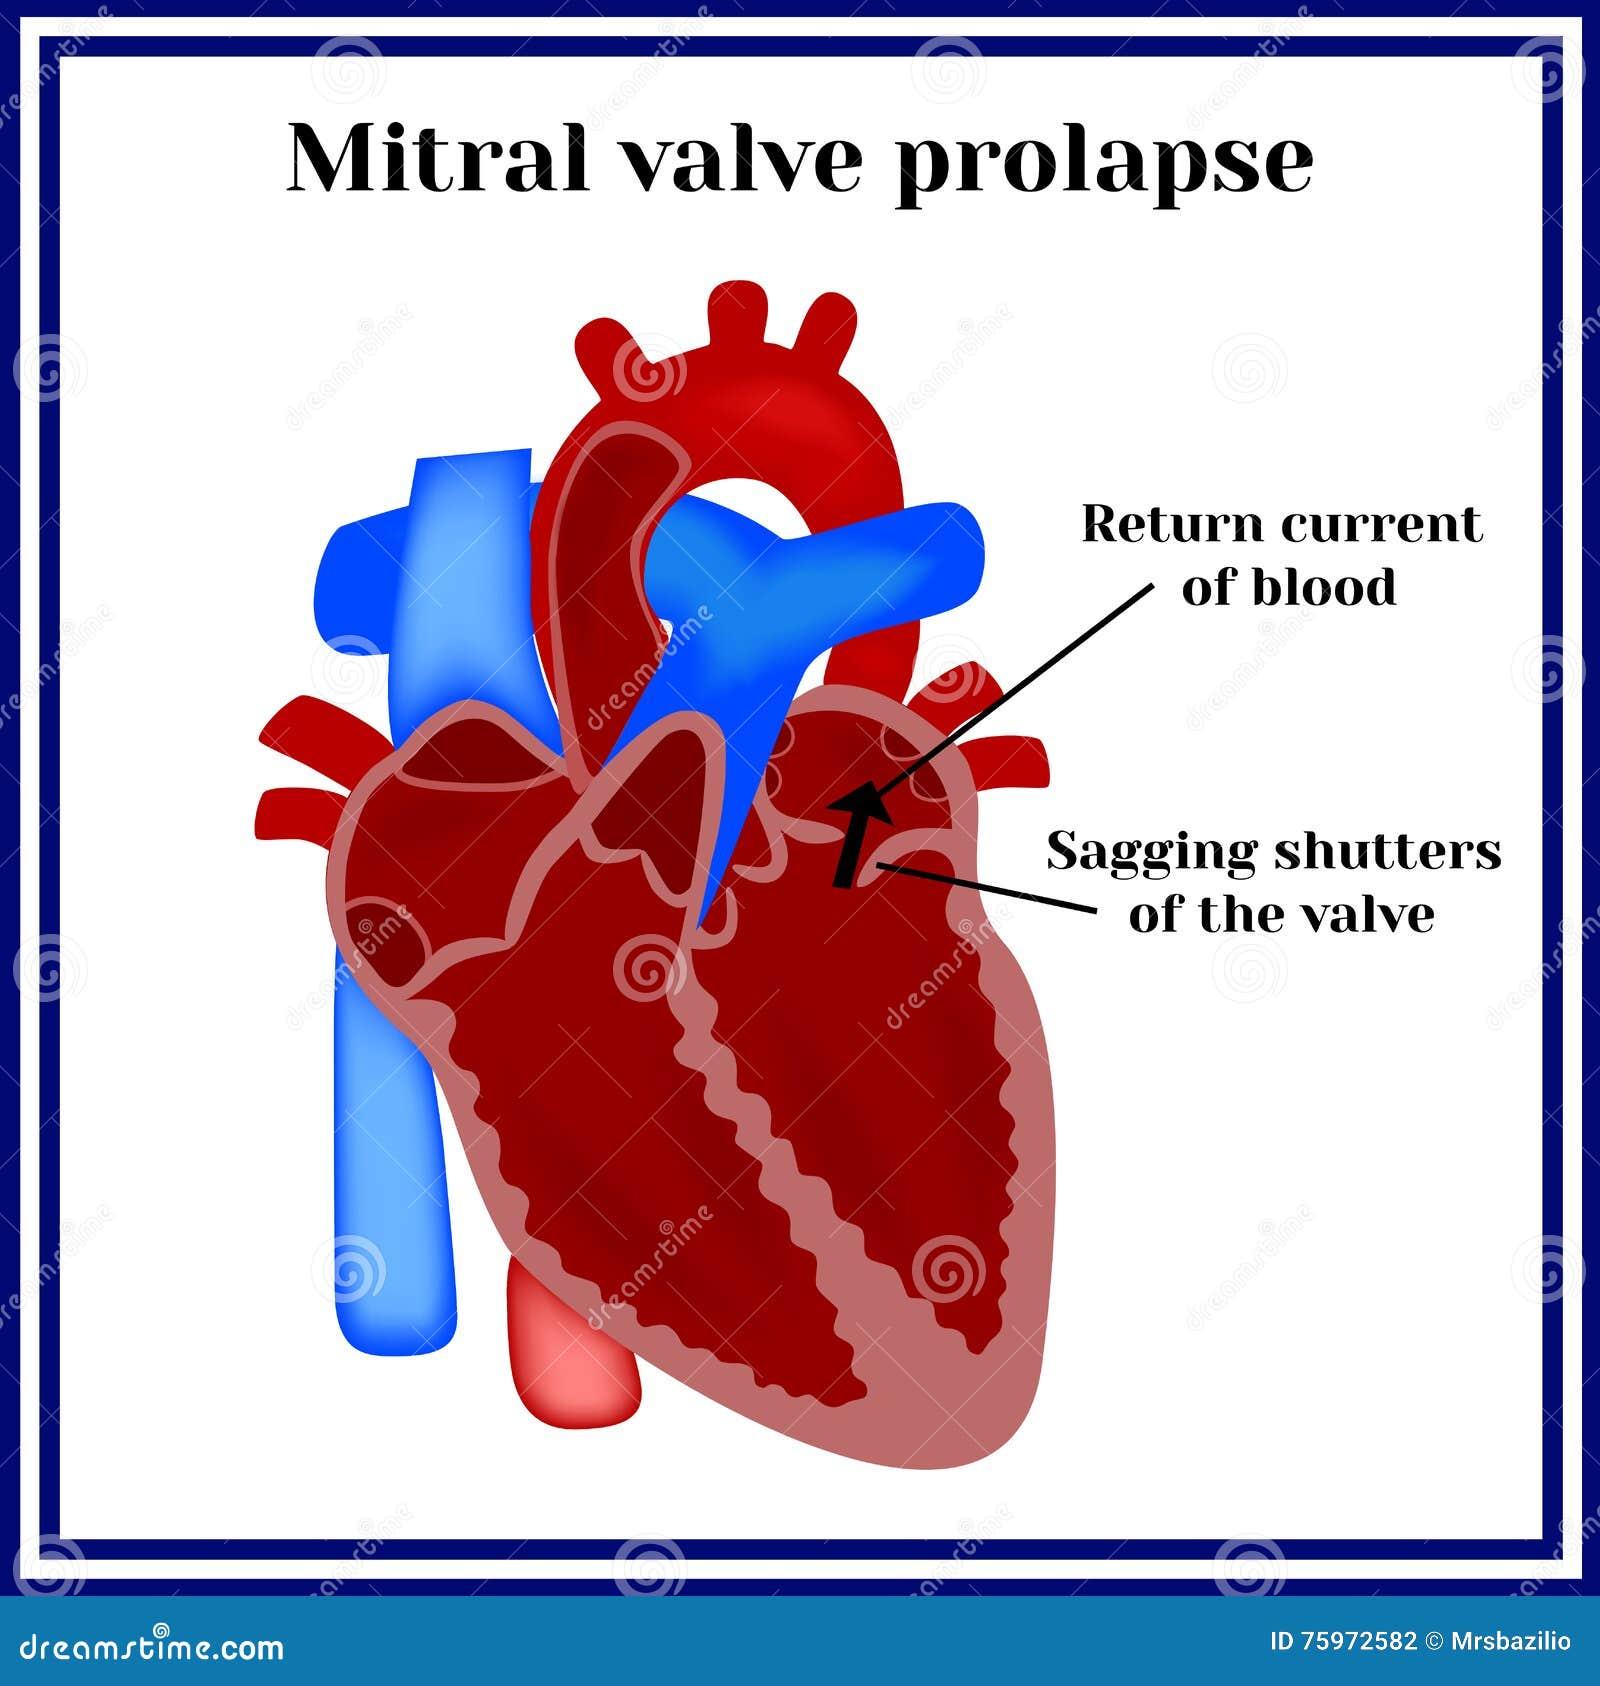 heart structure mitral valve prolapse cardiac pathology. Black Bedroom Furniture Sets. Home Design Ideas